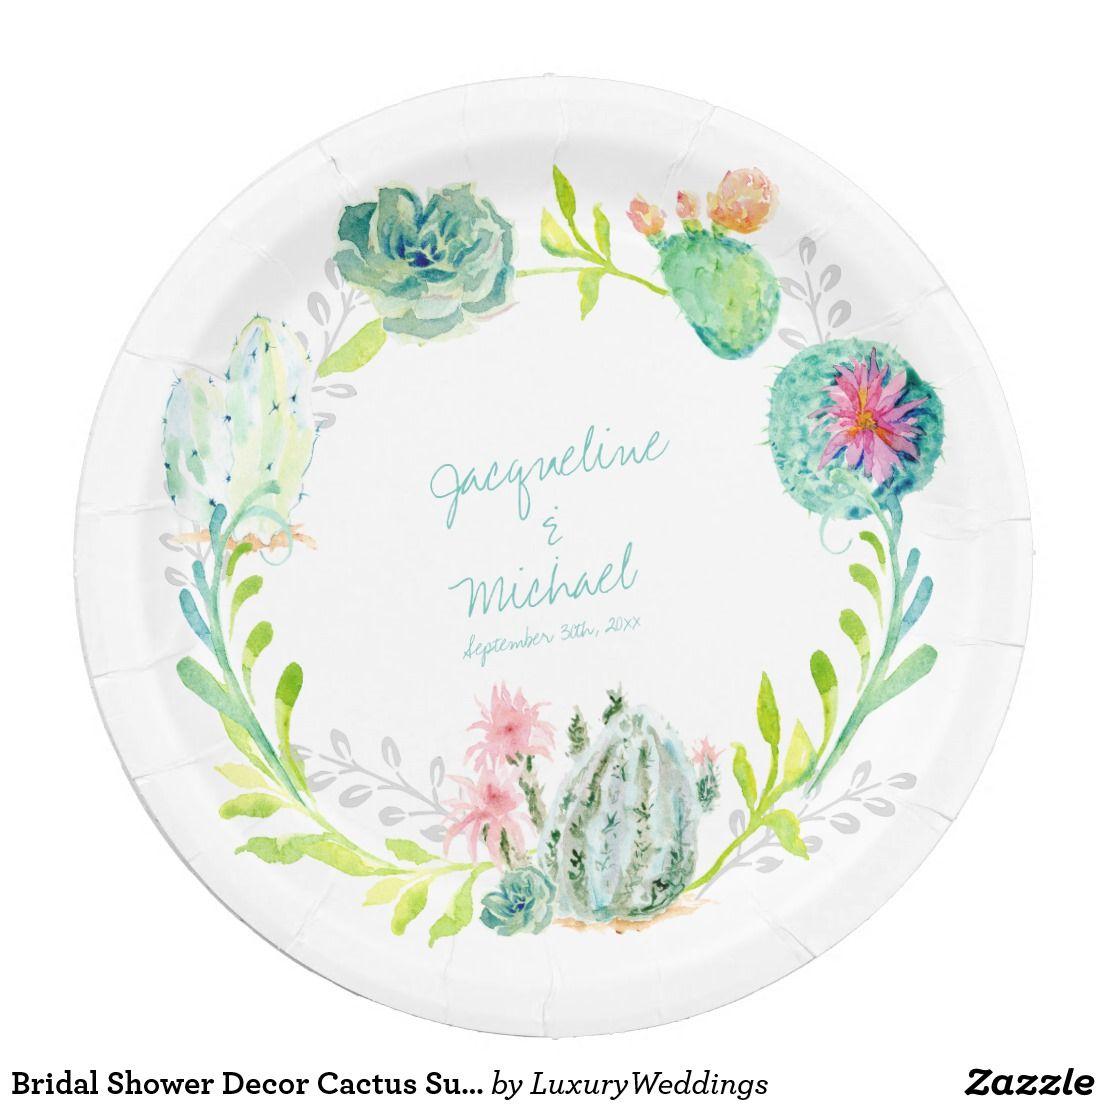 Bridal Shower Decor Cactus Succulent Flower Desert Paper Plate